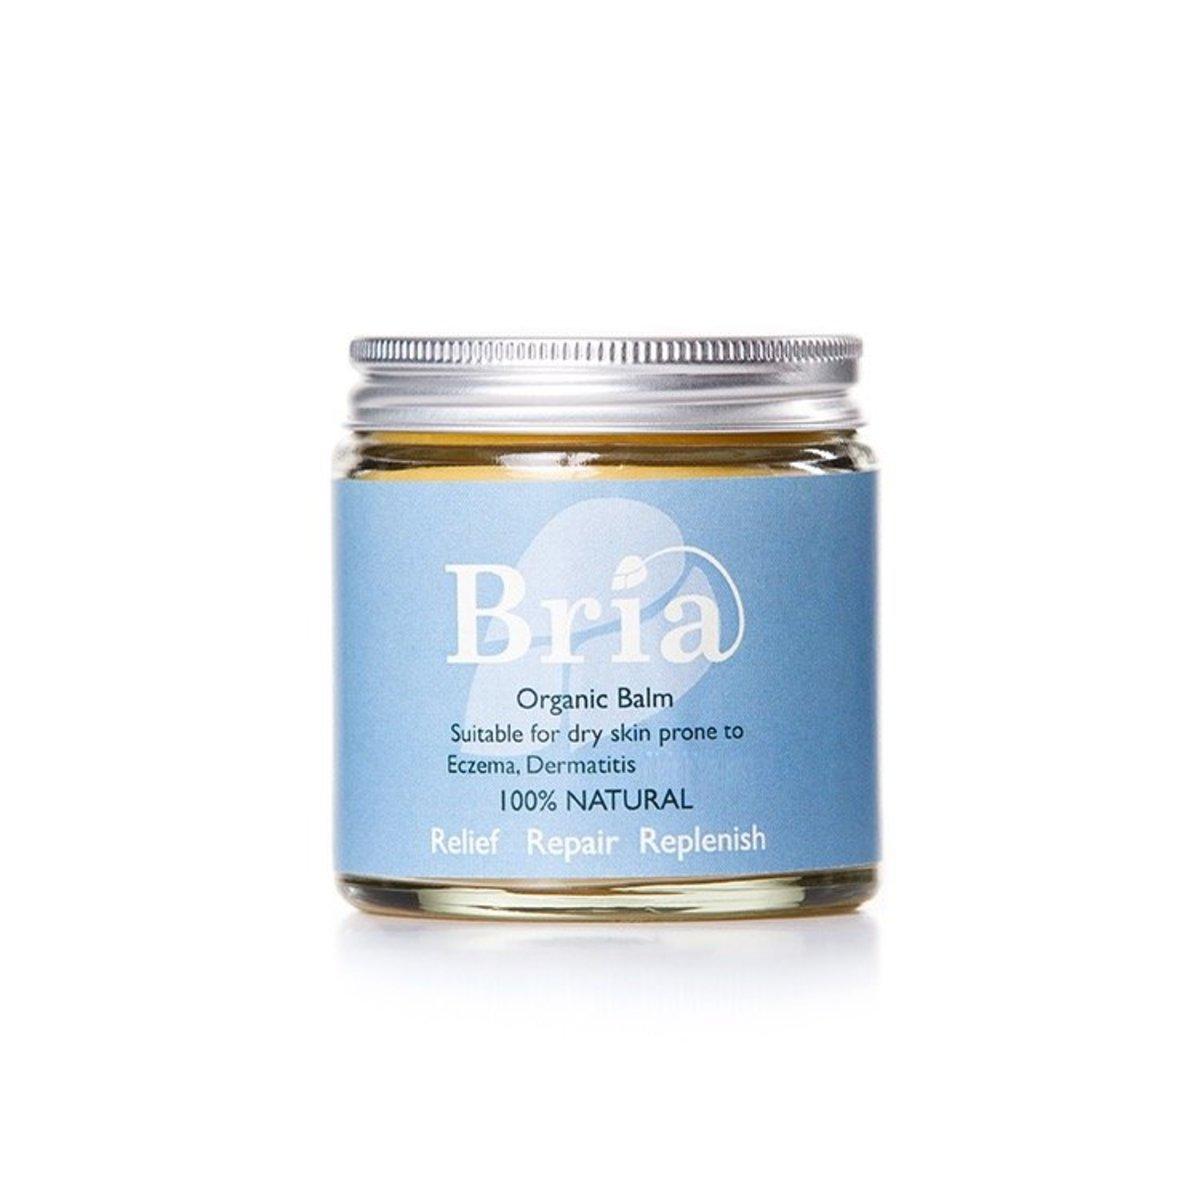 Organic Balm Prone to Eczema, Dermatitis & More